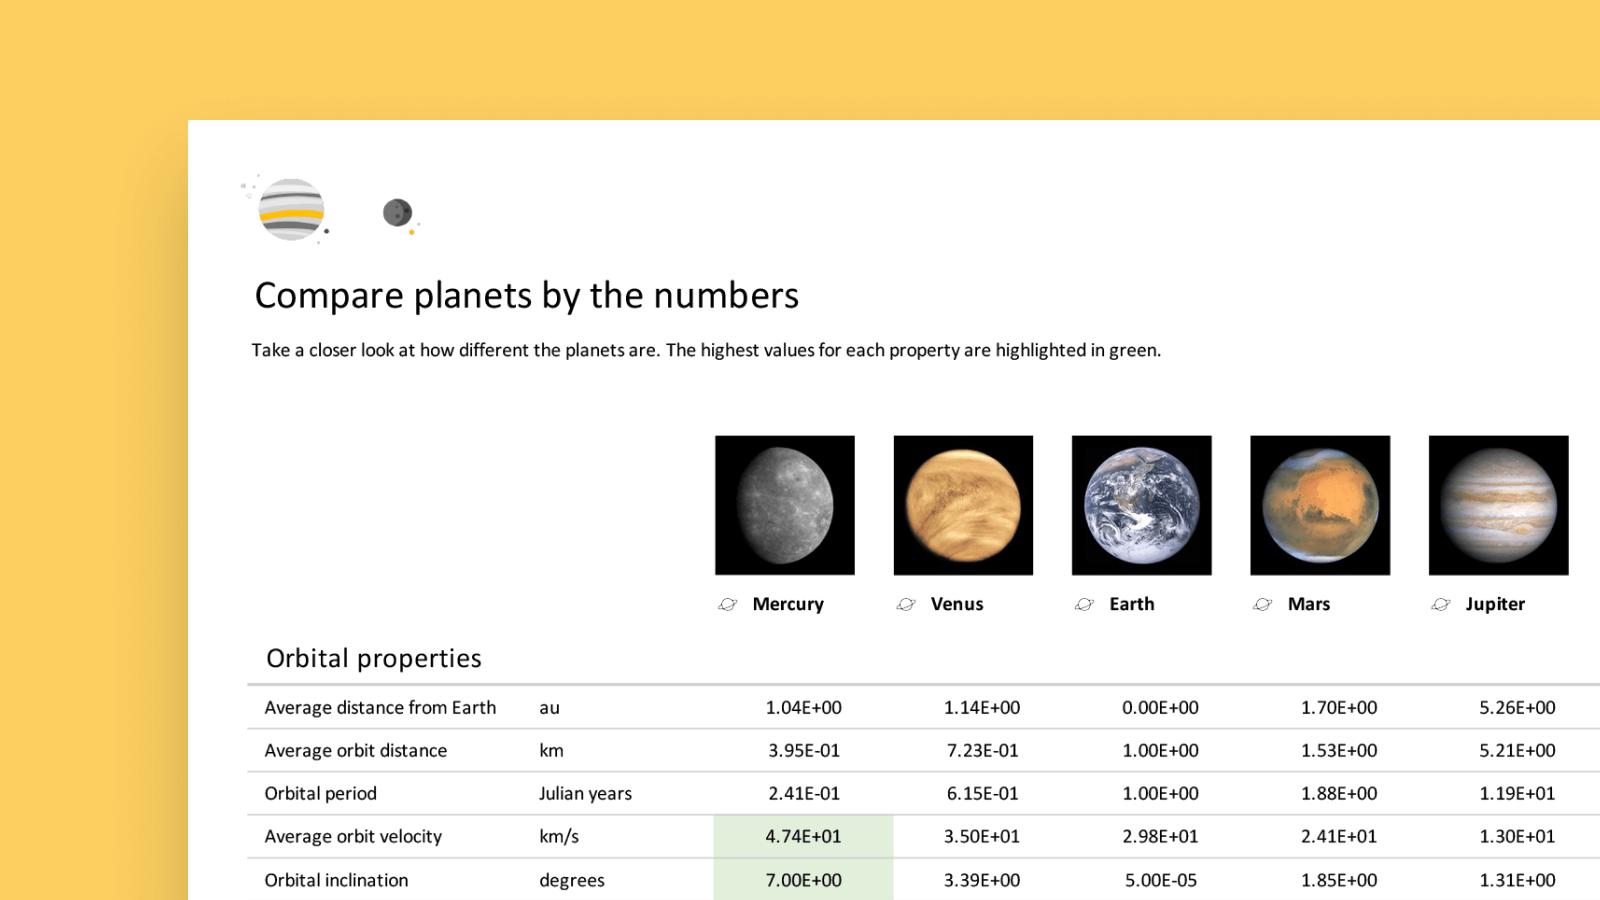 screenshot del modello dei pianeti Wolfram